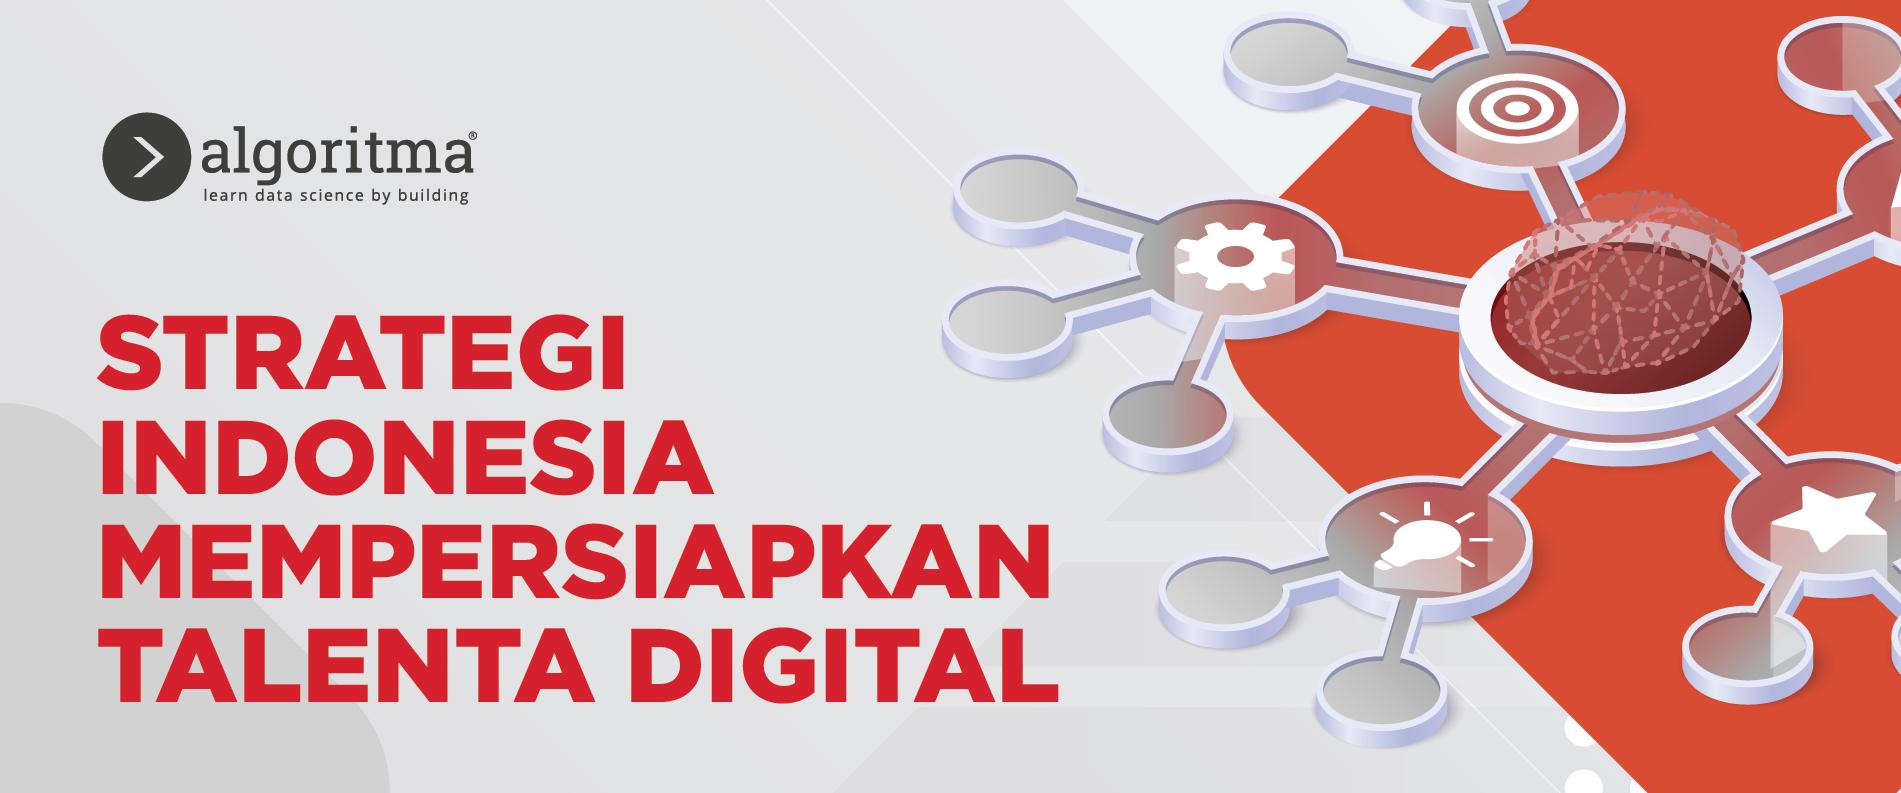 Strategi Indonesia Mempersiapkan Talenta Digital